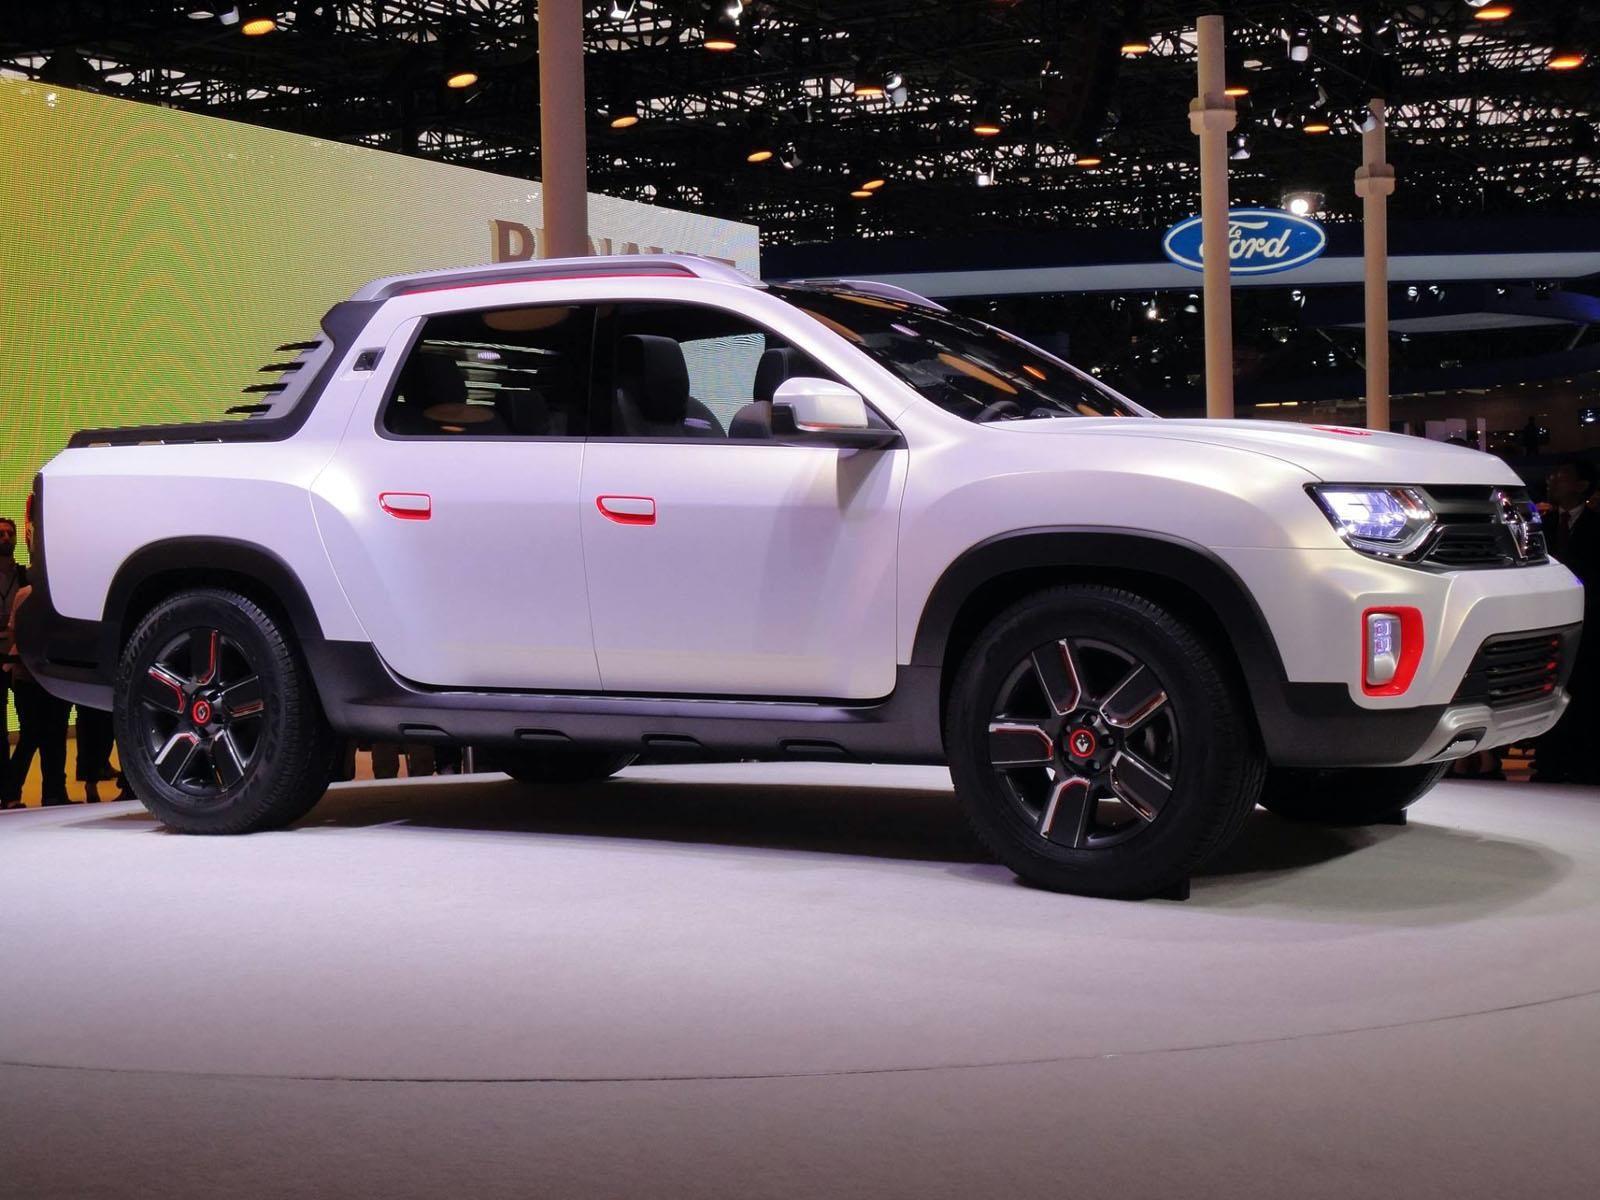 Teste Renault Duster Oroch Dynamique Automtica